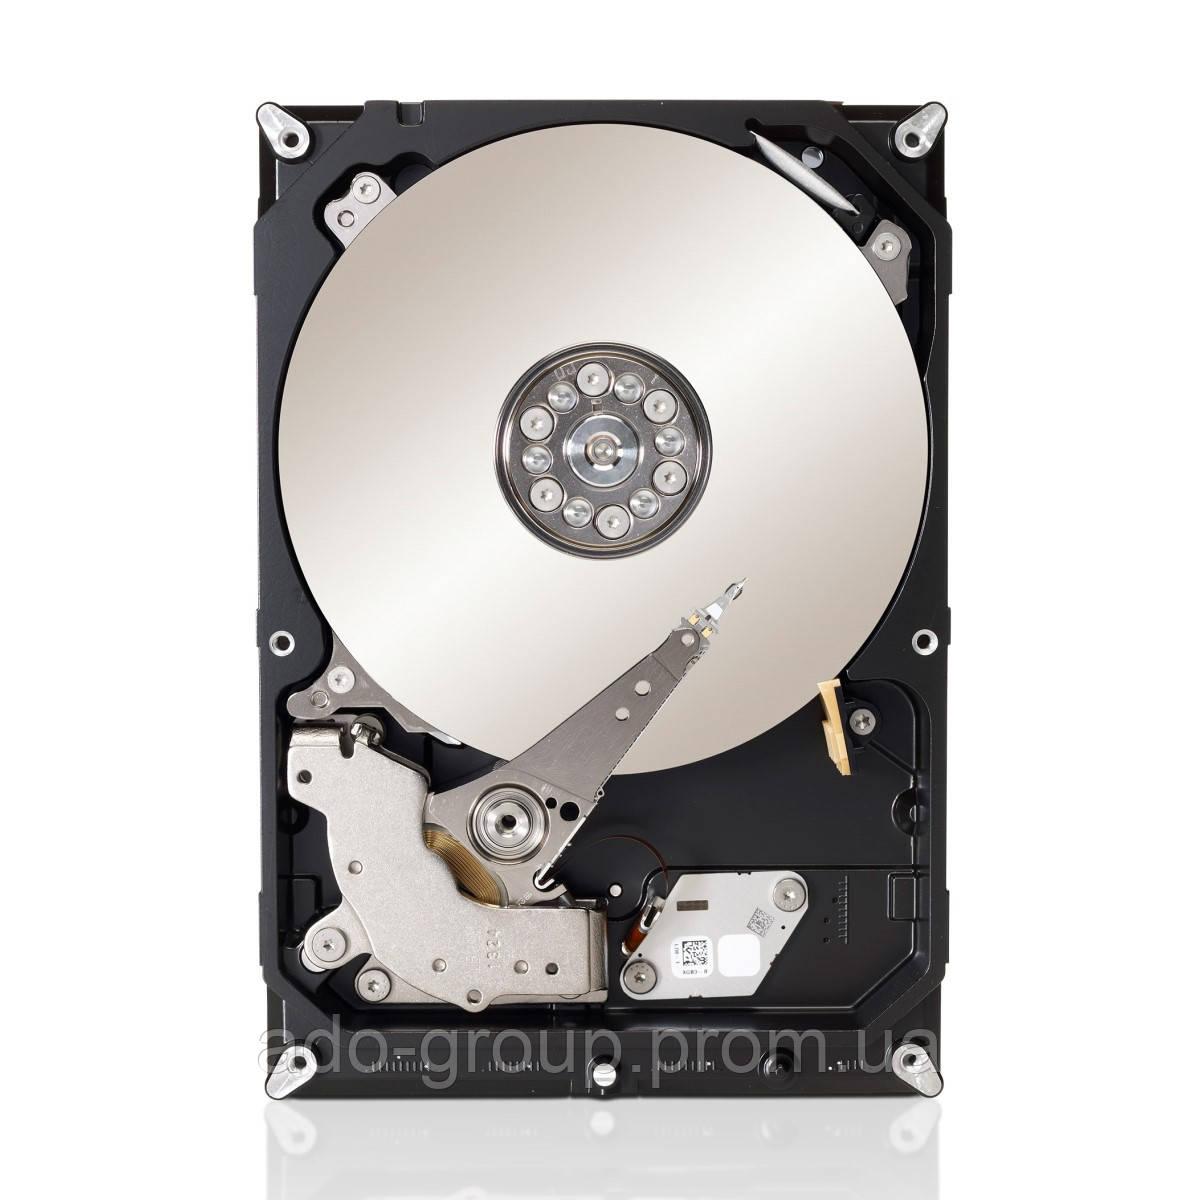 "39M4526 Жесткий диск IBM 250GB SATA 7.2K 3.5"""